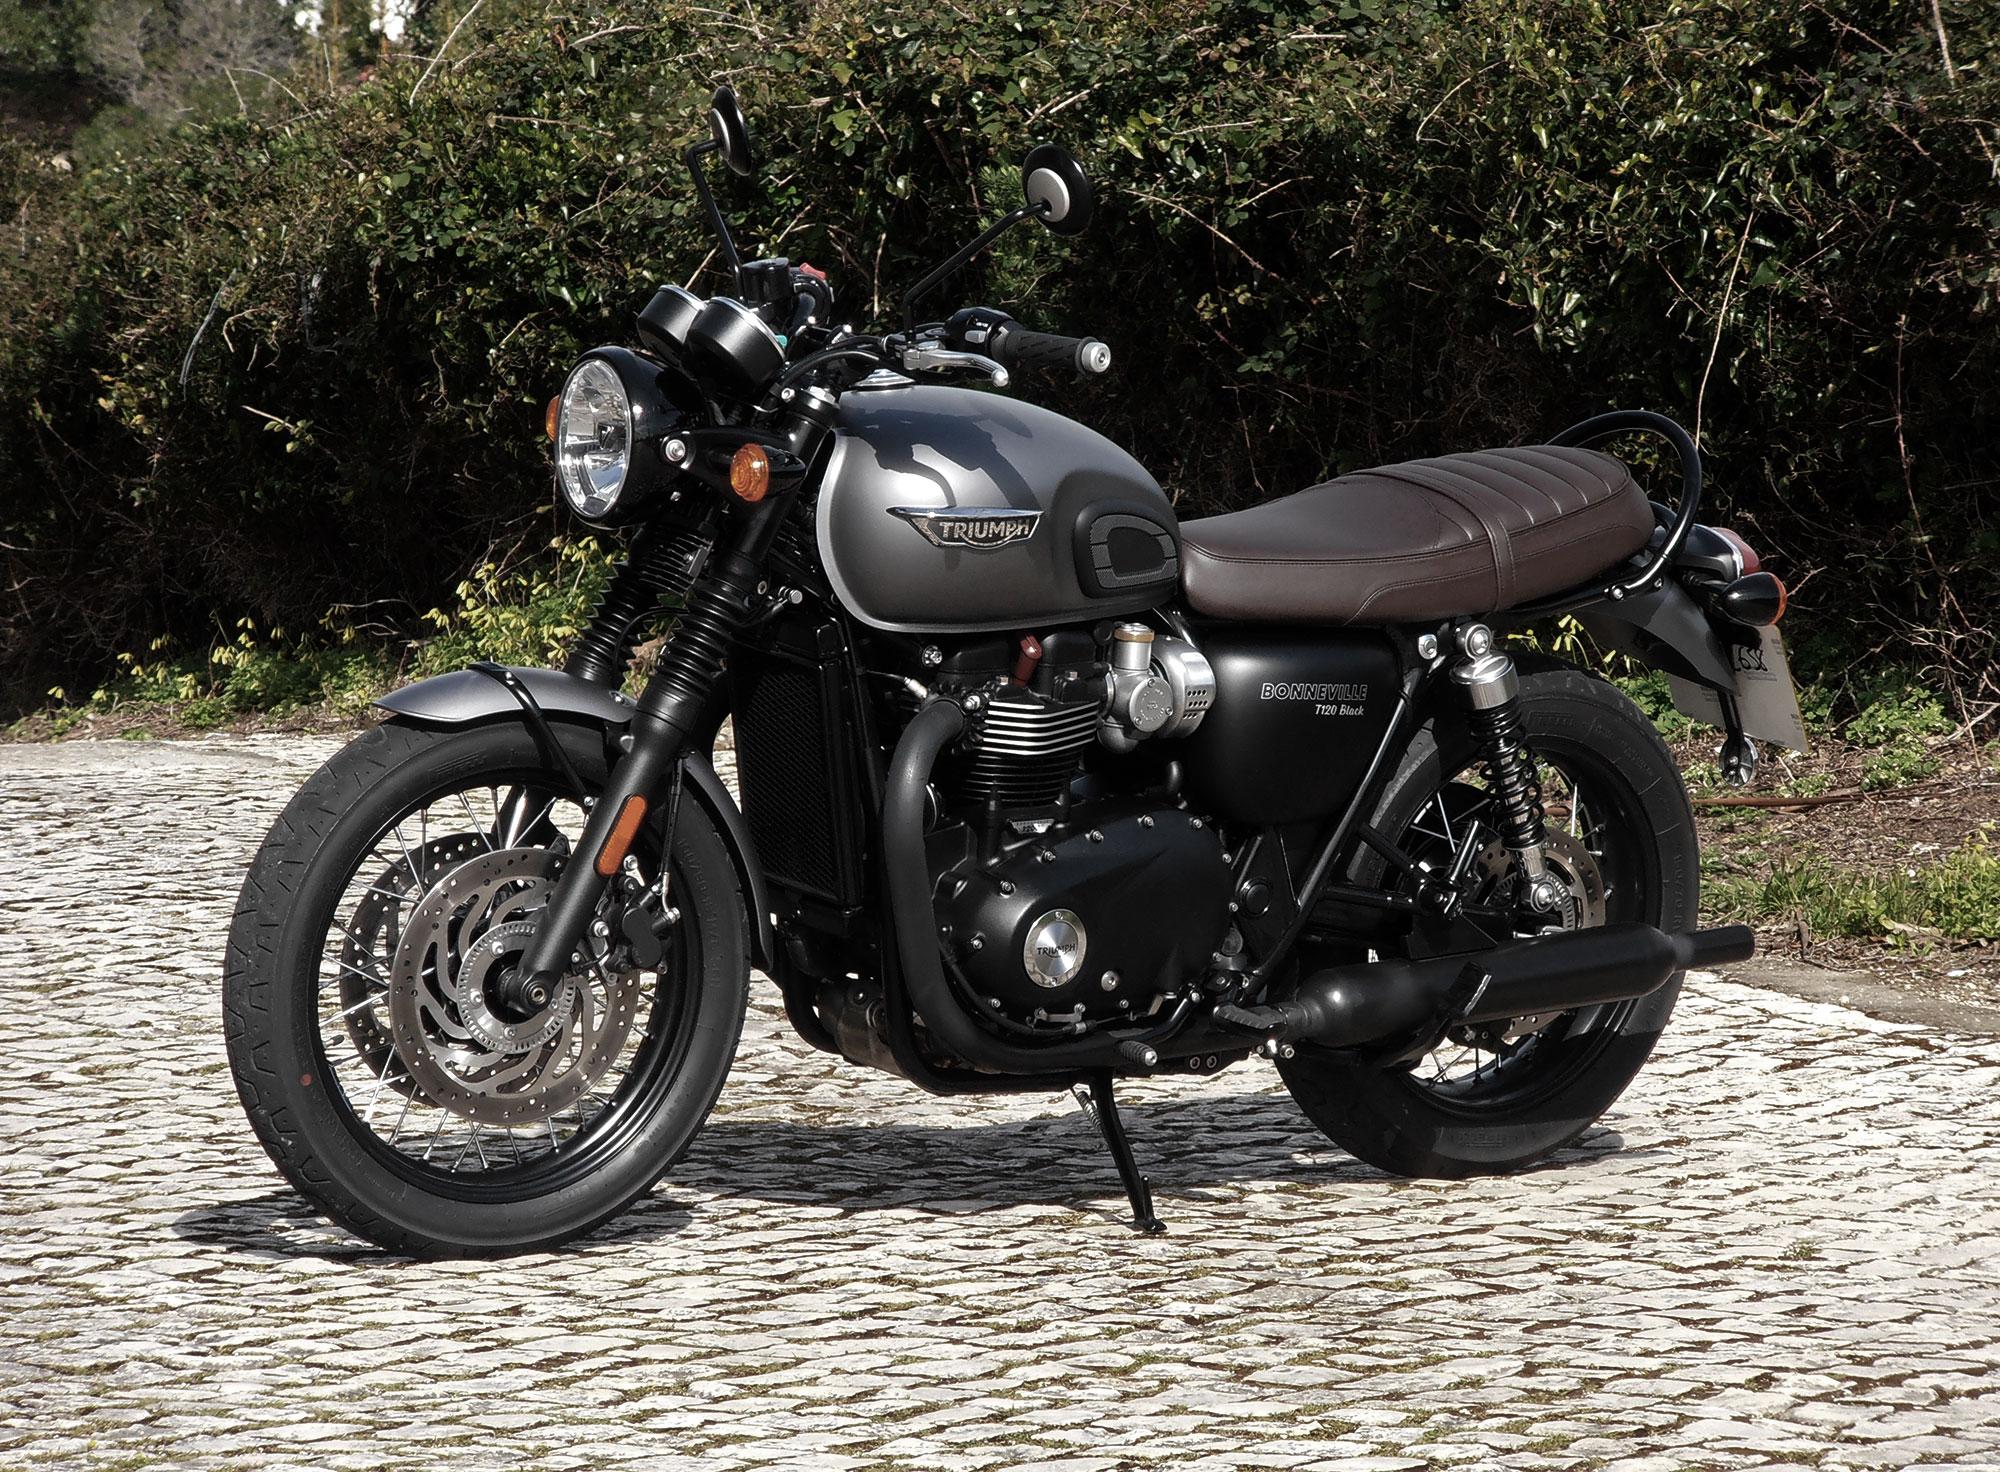 bonneville t120 black thruxton r ride review canada moto guide. Black Bedroom Furniture Sets. Home Design Ideas